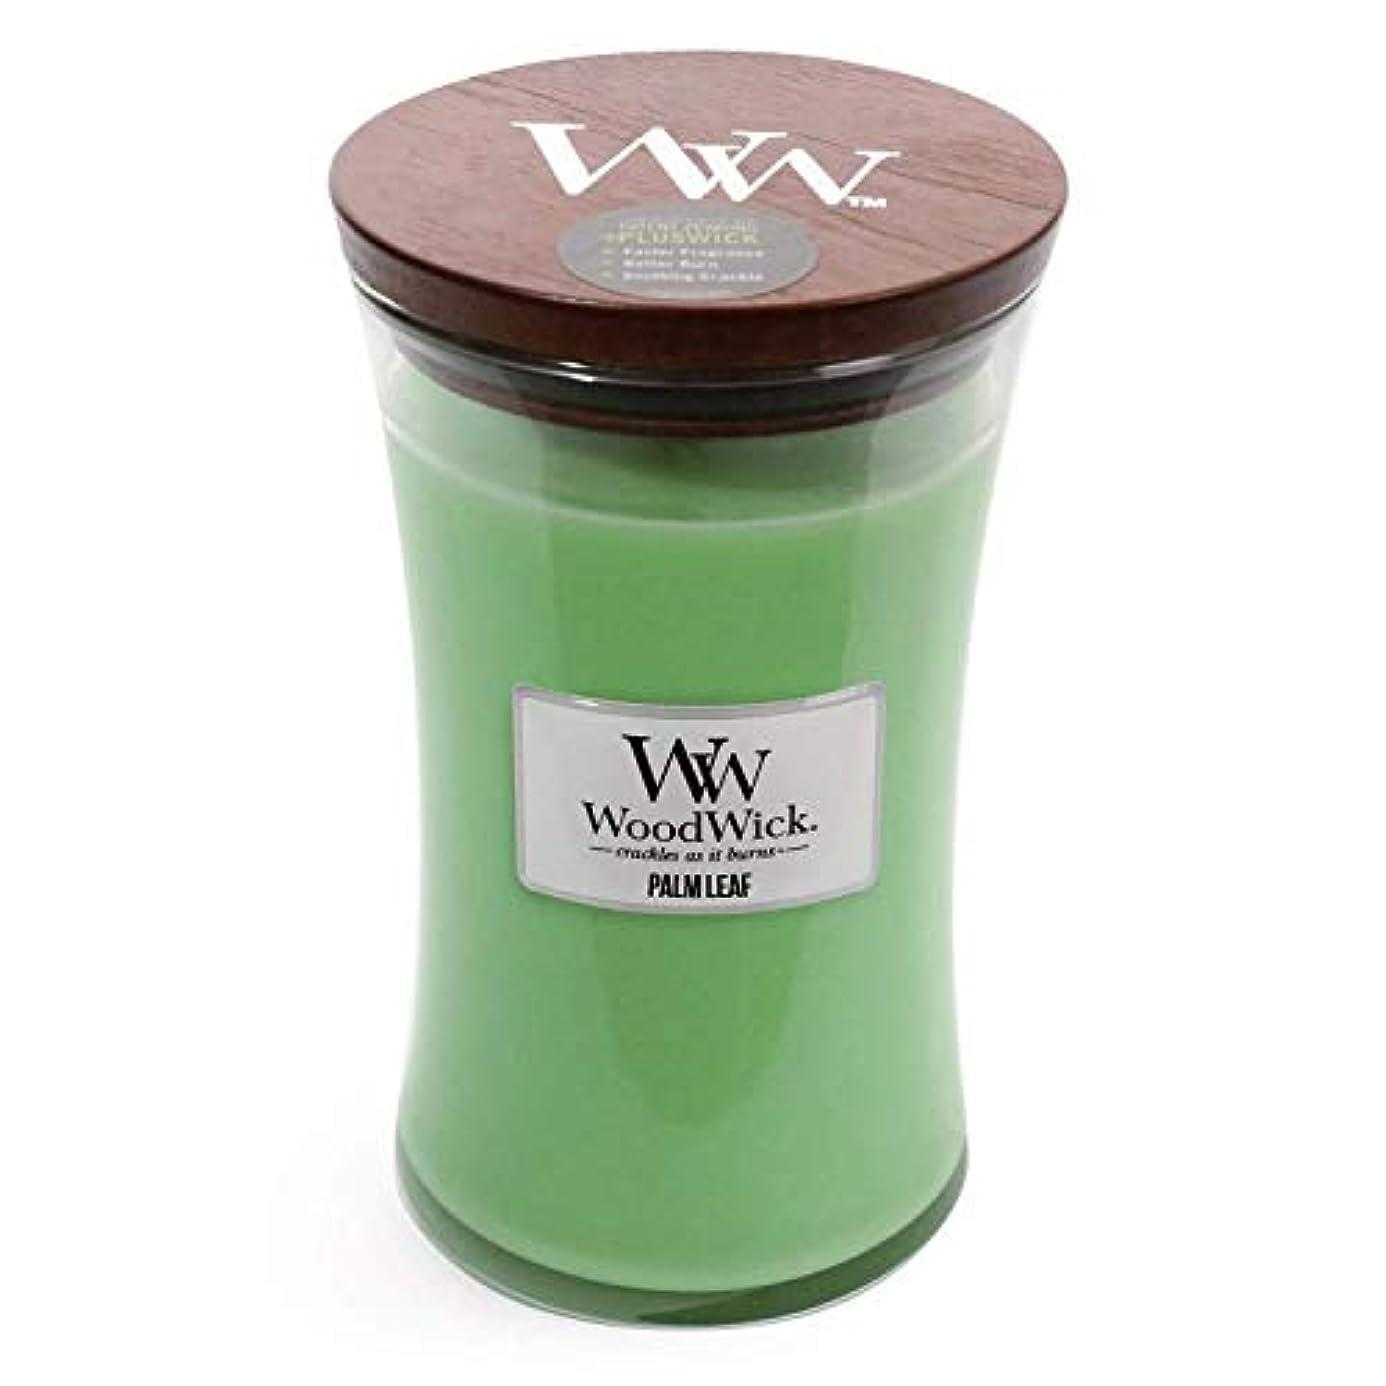 刑務所先例雄弁なPalm Leaf WoodWick 22 oz Large砂時計Jar Candle Burns 180時間